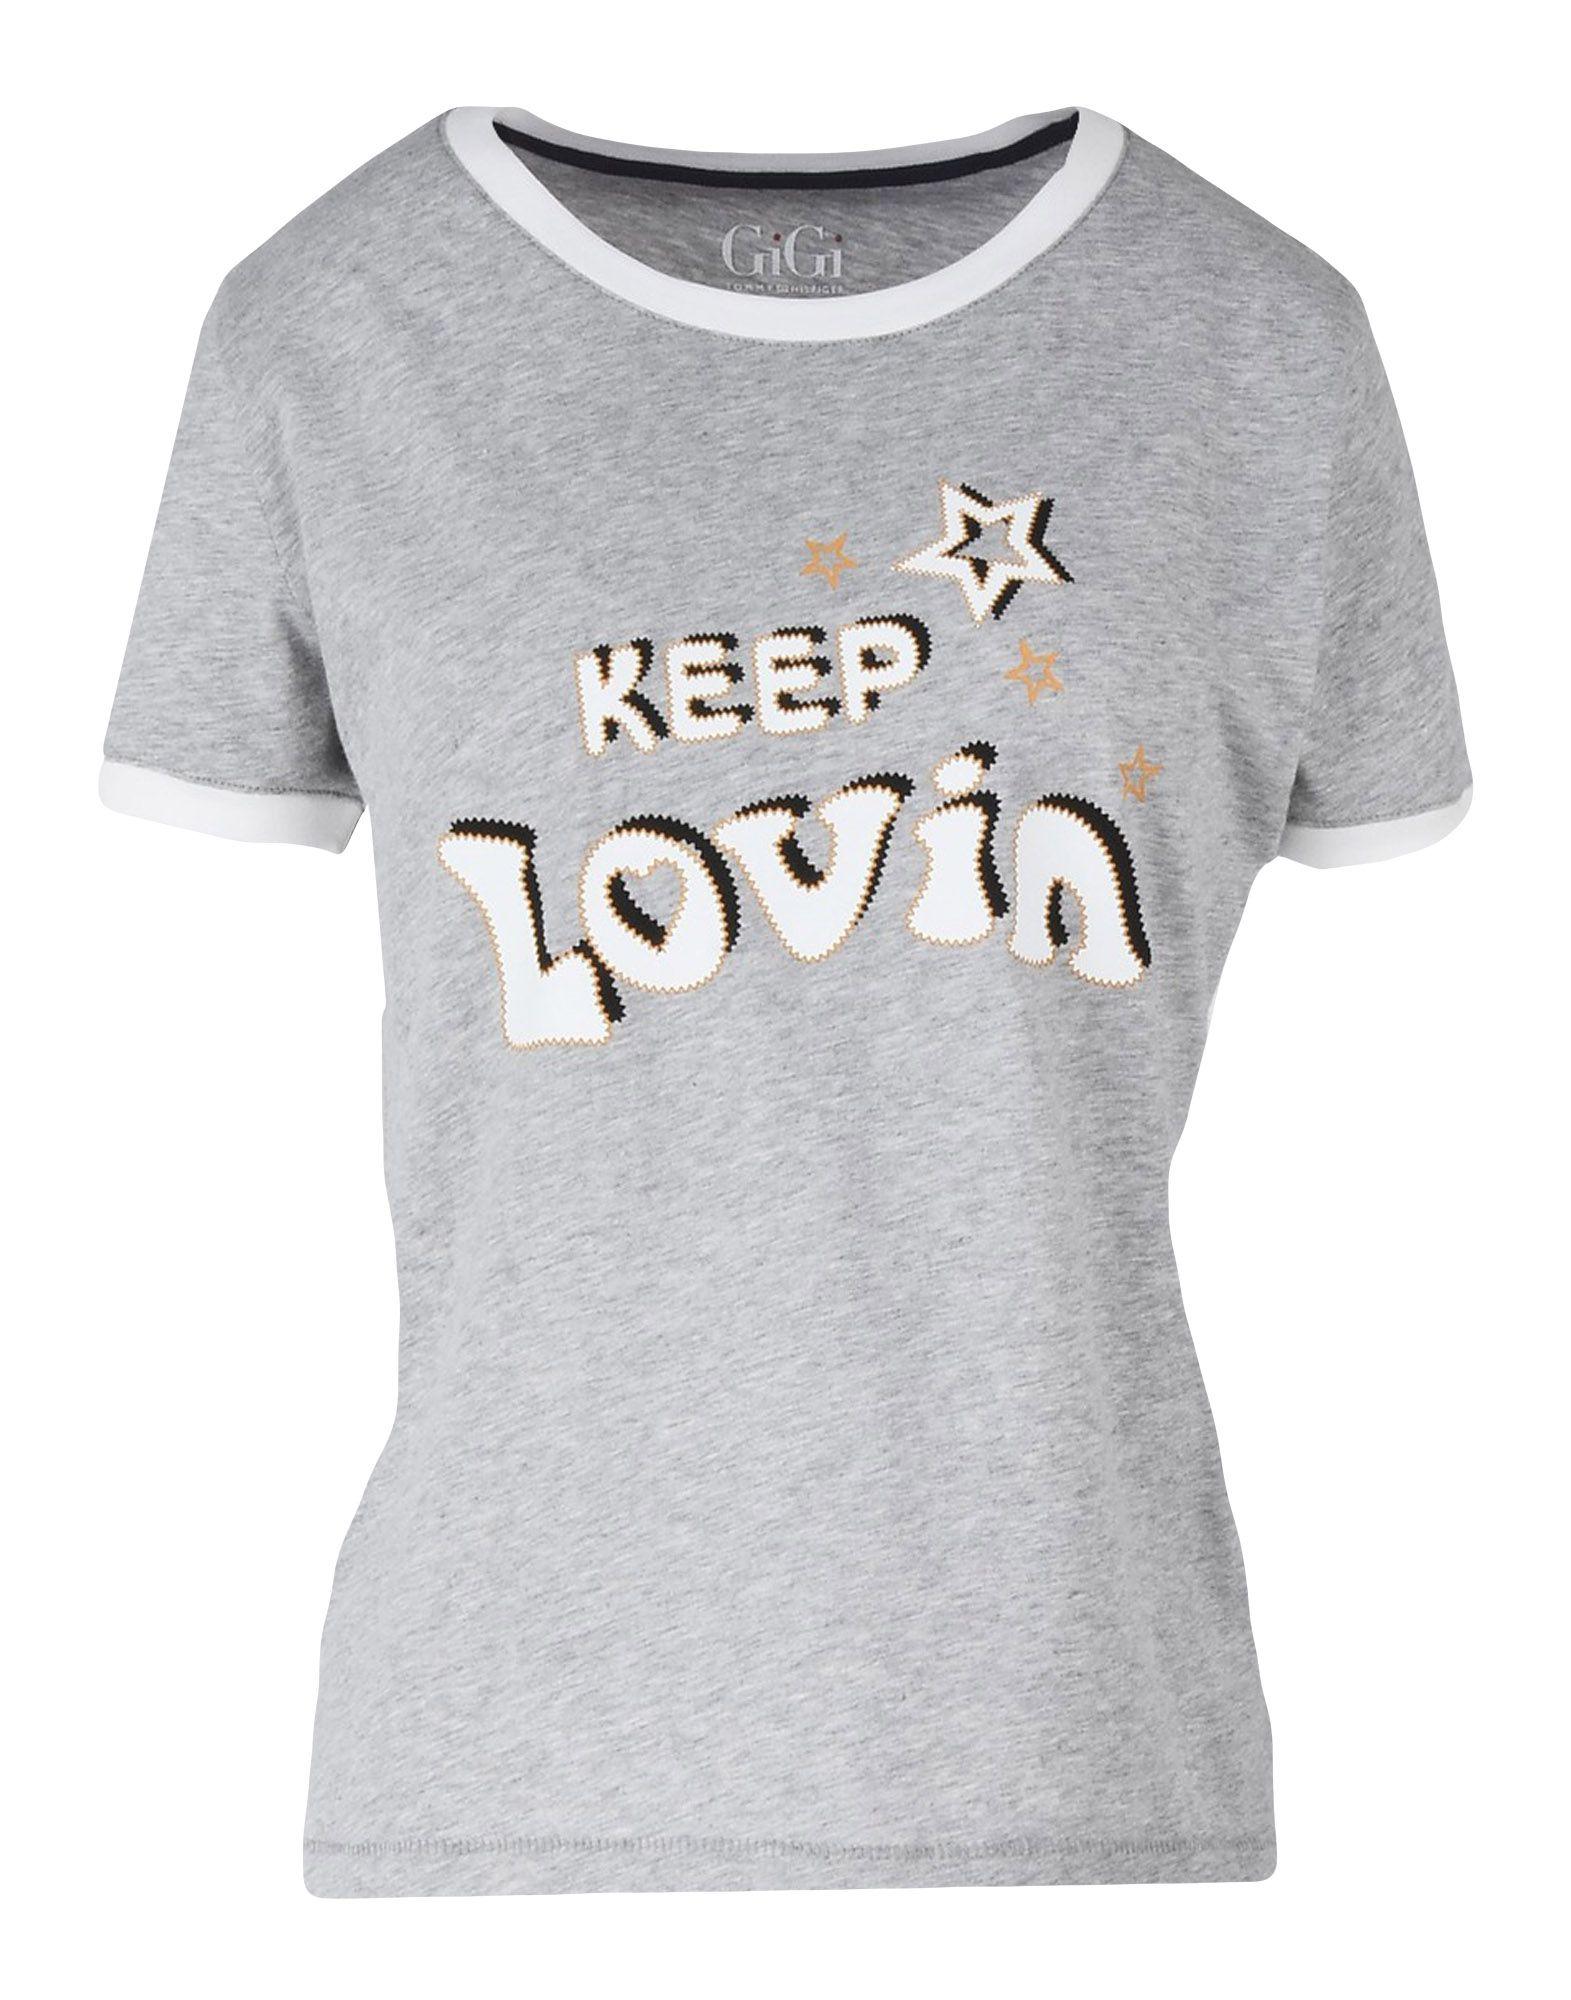 64c8a8d3 Gigi Hadid X Tommy Hilfiger Gigi Ringer Tee Keep Lovin - T-Shirt ...